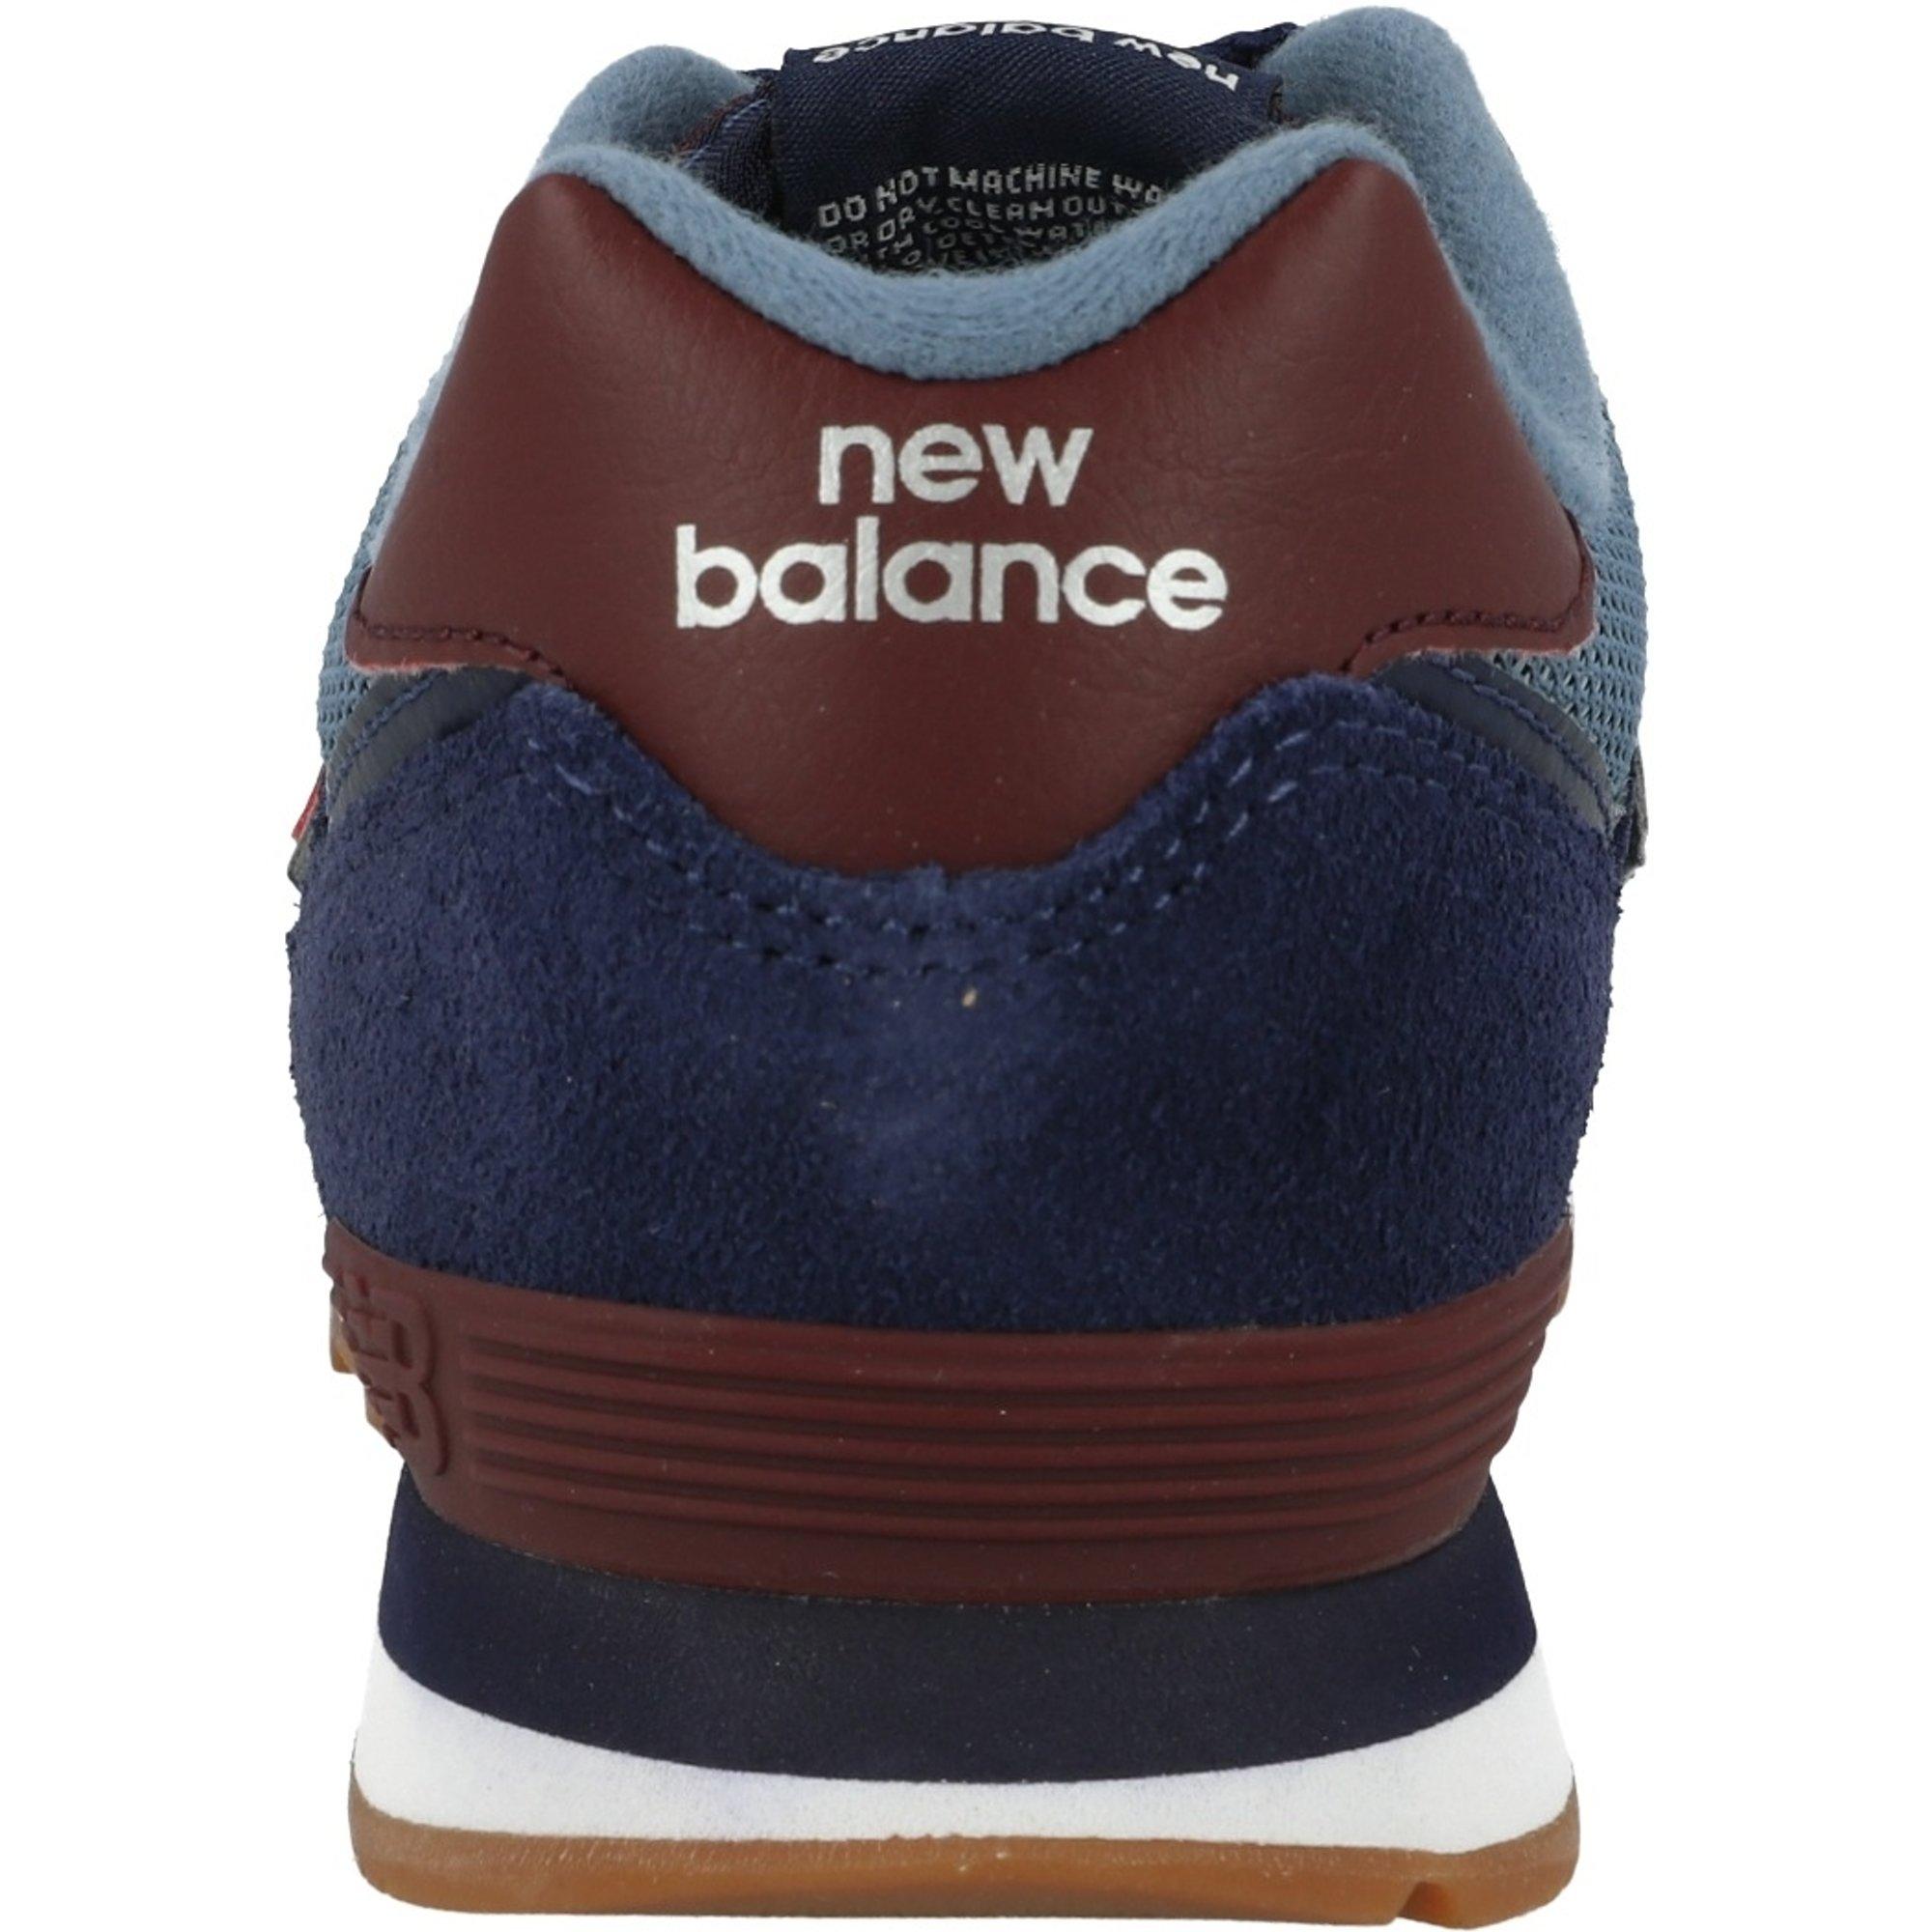 New Balance 574 Evergreen Suede